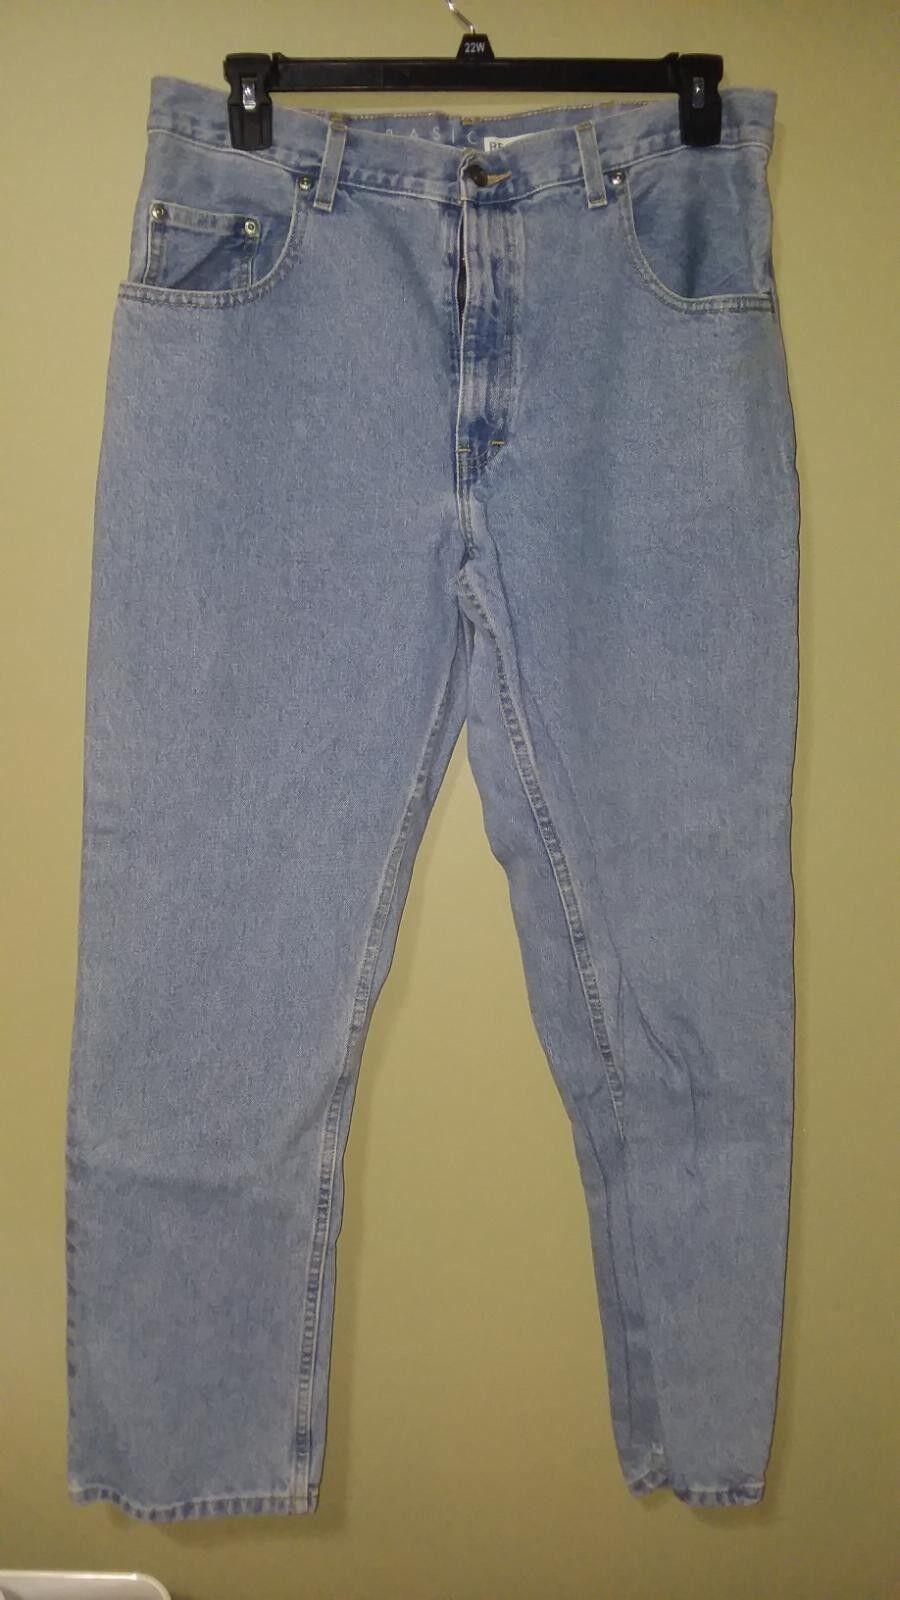 Basic Editions regular fit light wash denim jeans W36 X L32